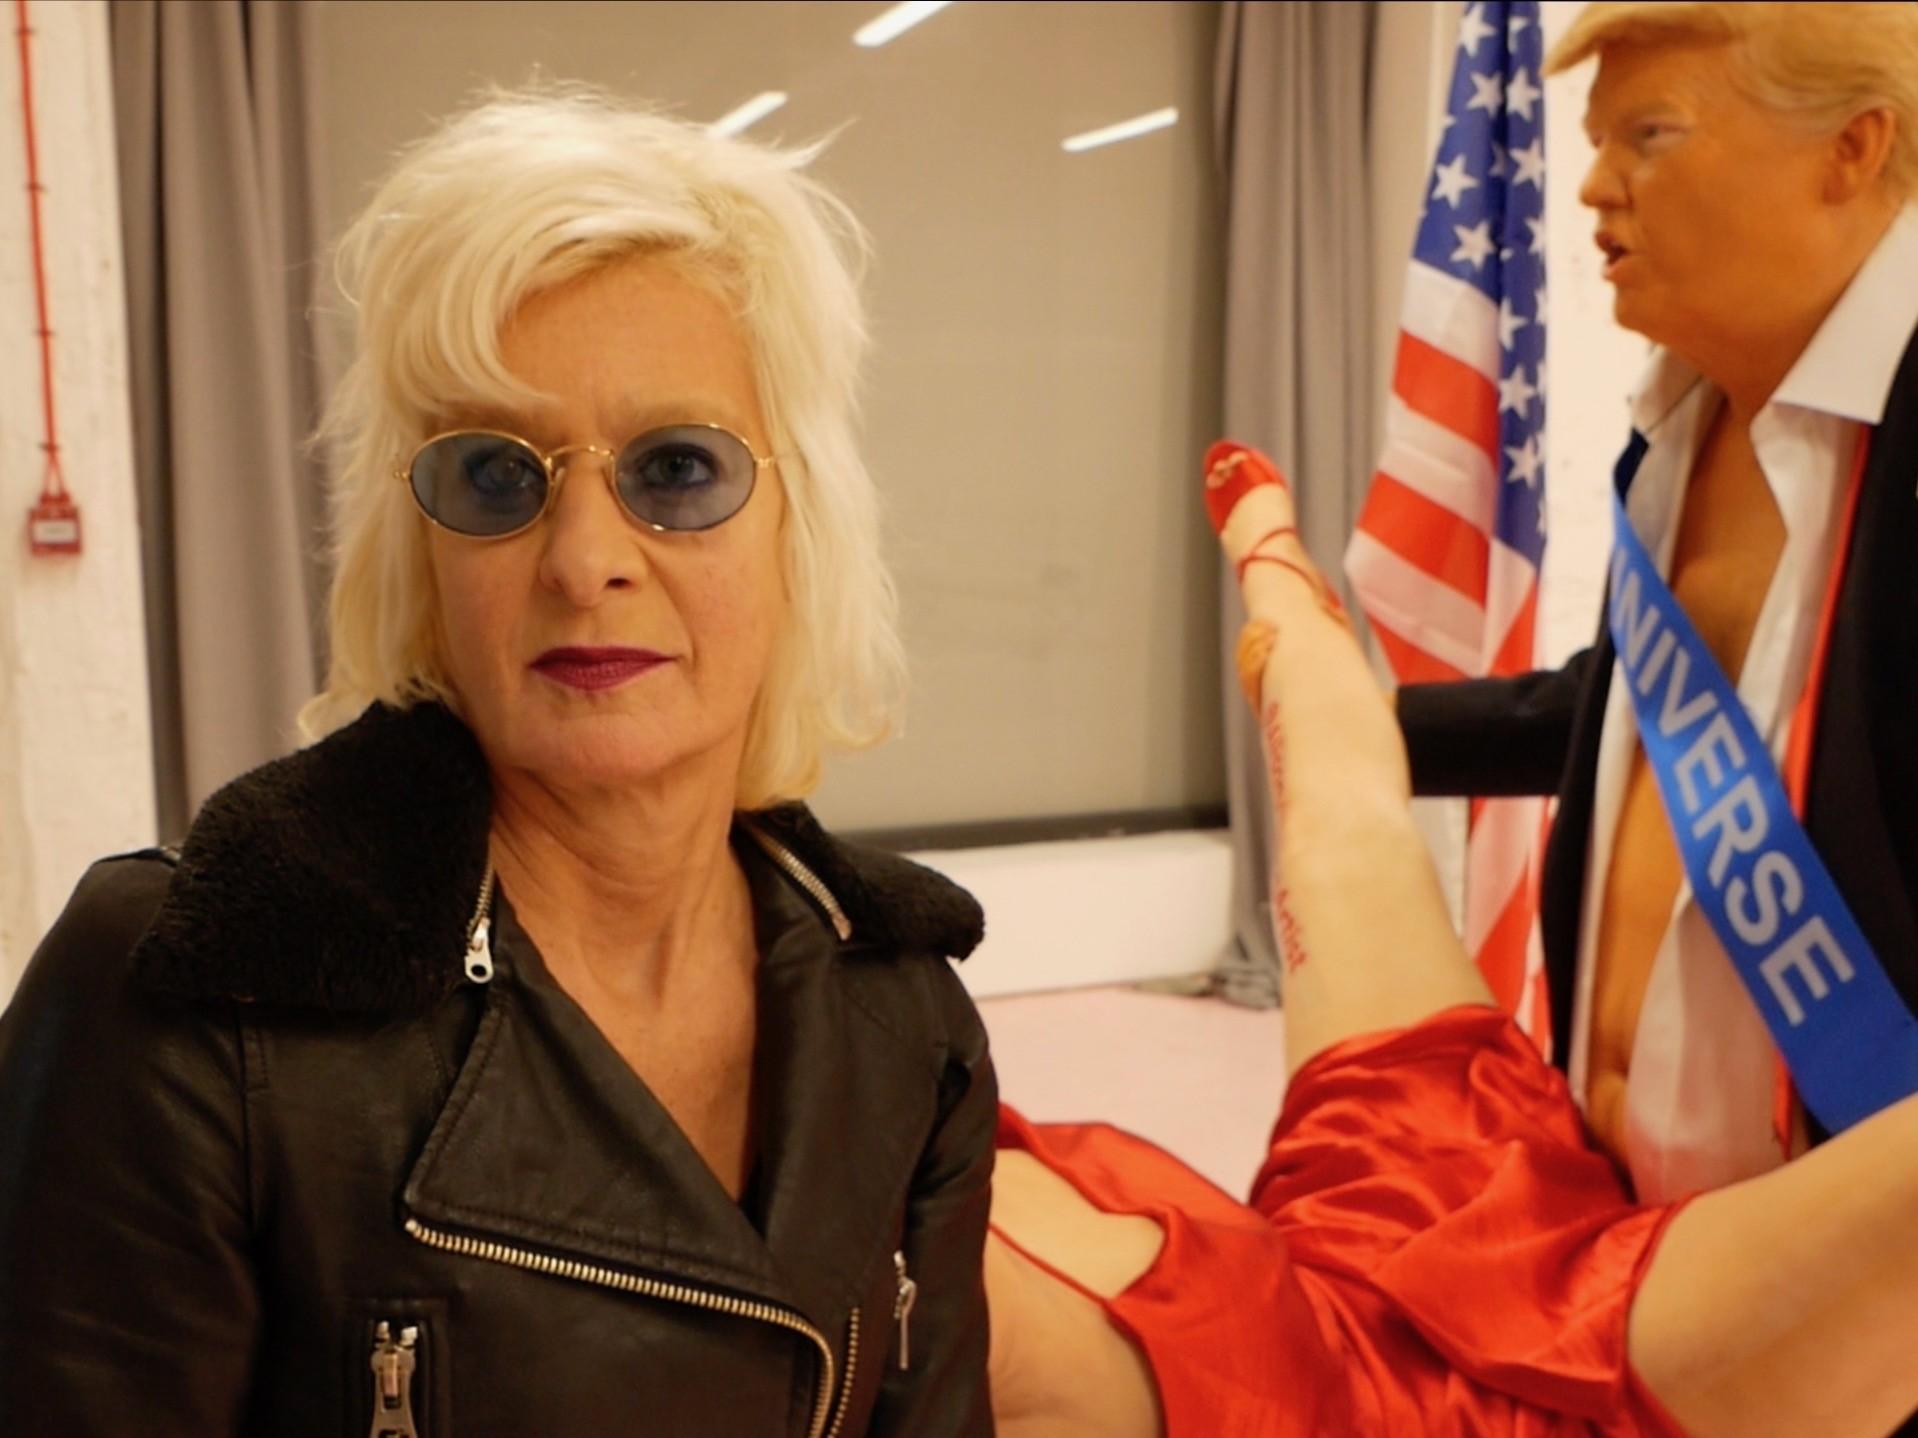 British artist Alison Jackson stands in front of her 'Official Presidential Send Off' sculpture, October 28, 2020. Kurt Zindulka, Breitbart News